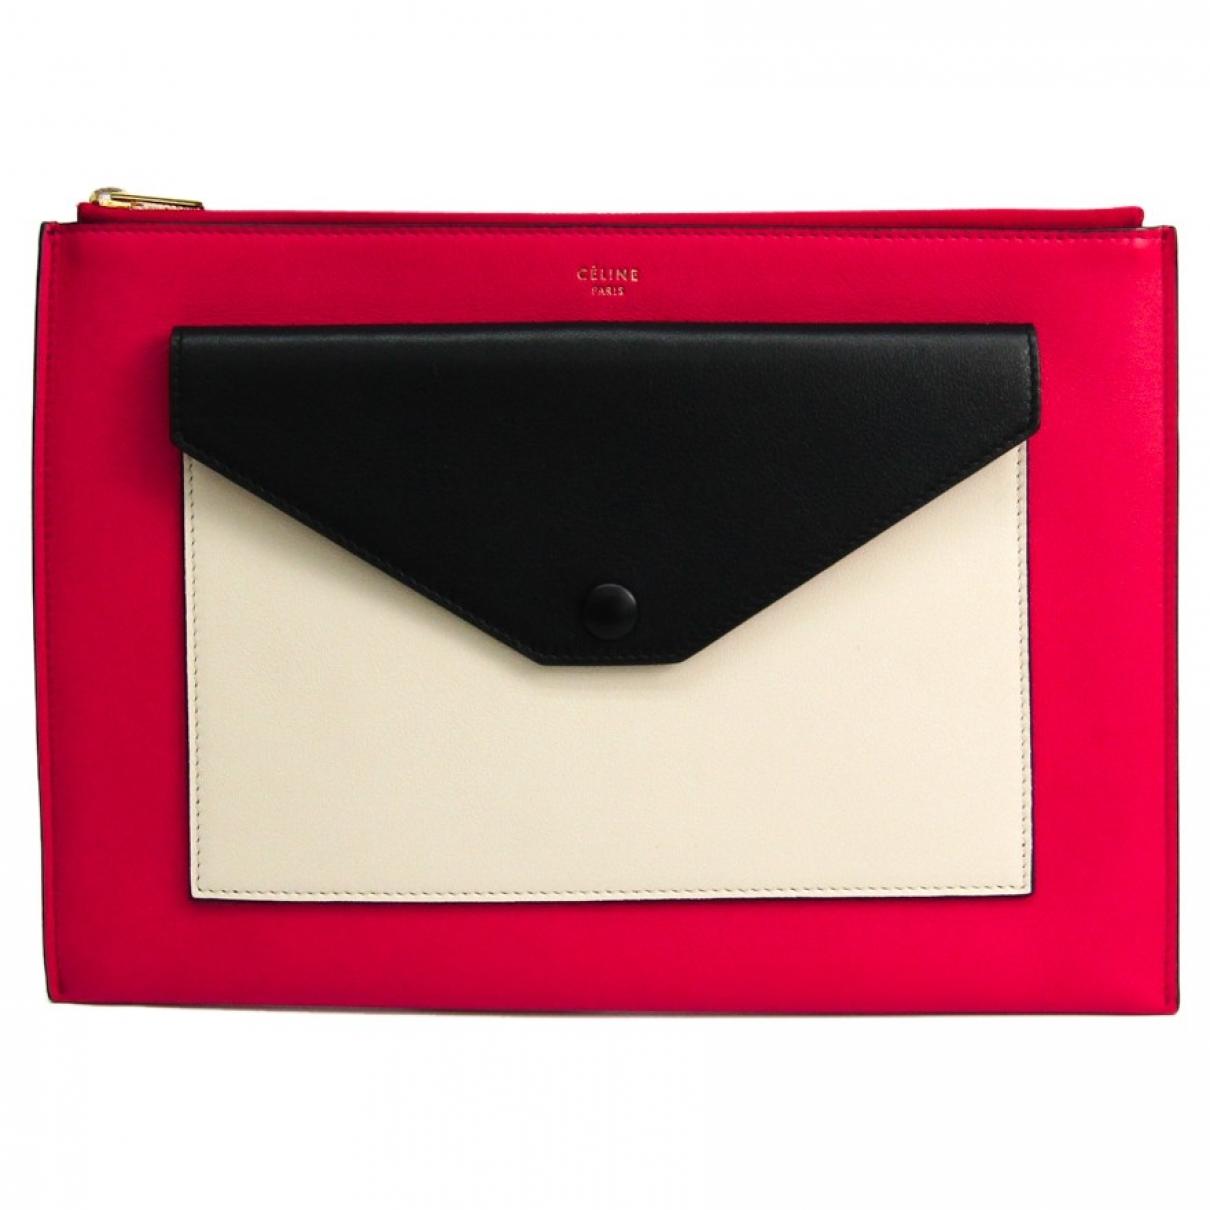 Celine \N Pink Leather Clutch bag for Women \N